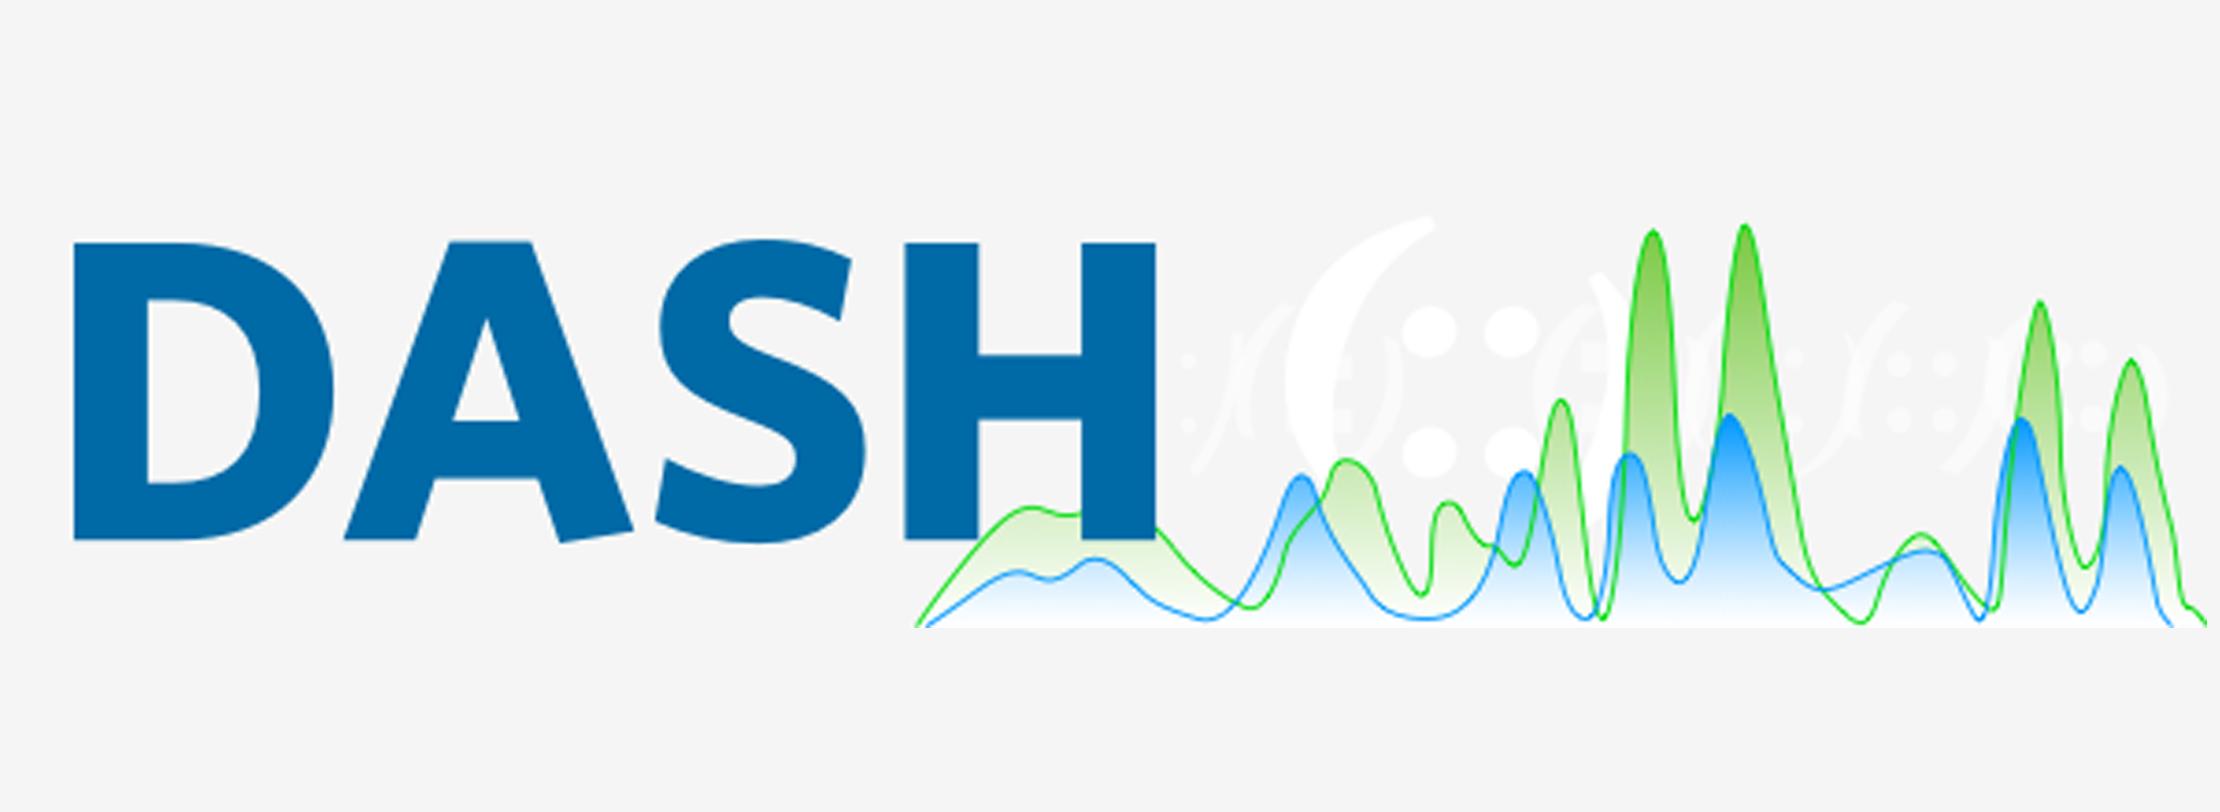 Using DASH to identify economies by suspicious traffic